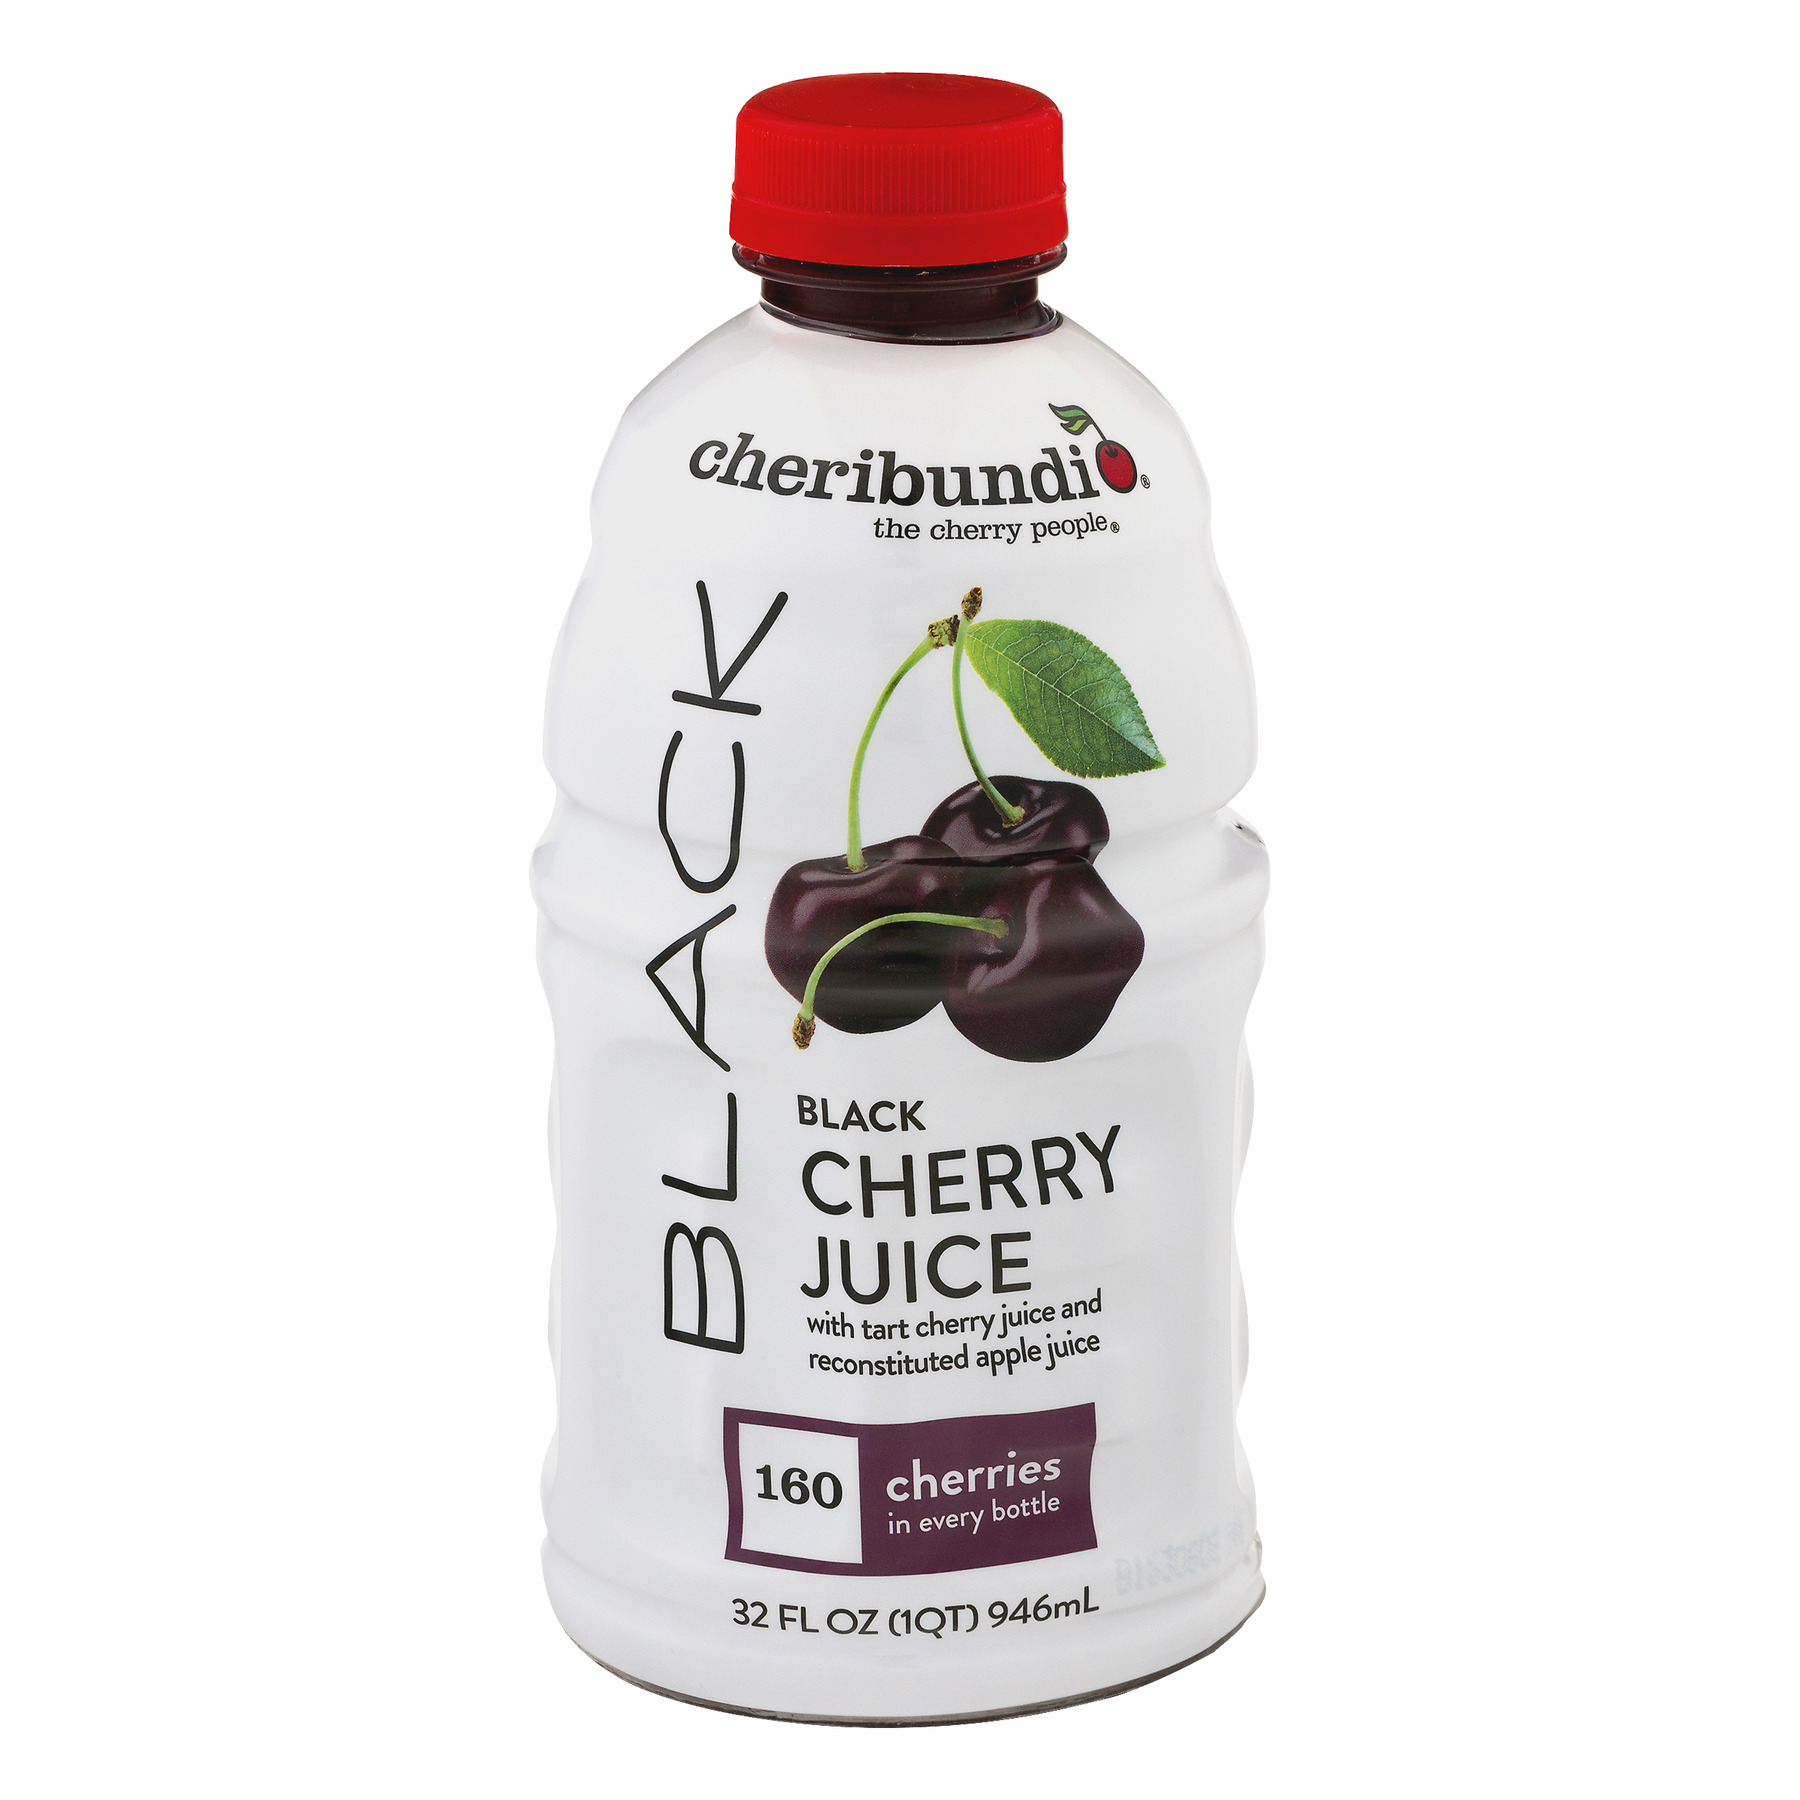 Cheribundi Black Cherry Juice, 32 Fl Oz, 1 Count